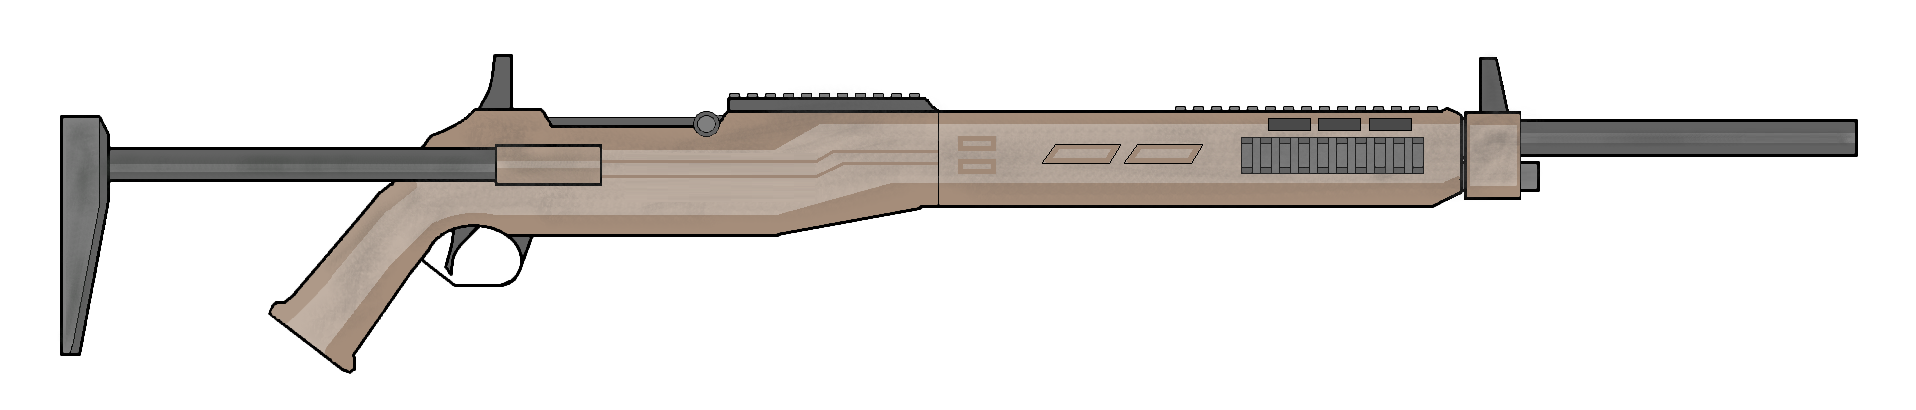 M1 Garand 2040 by Artmarcus